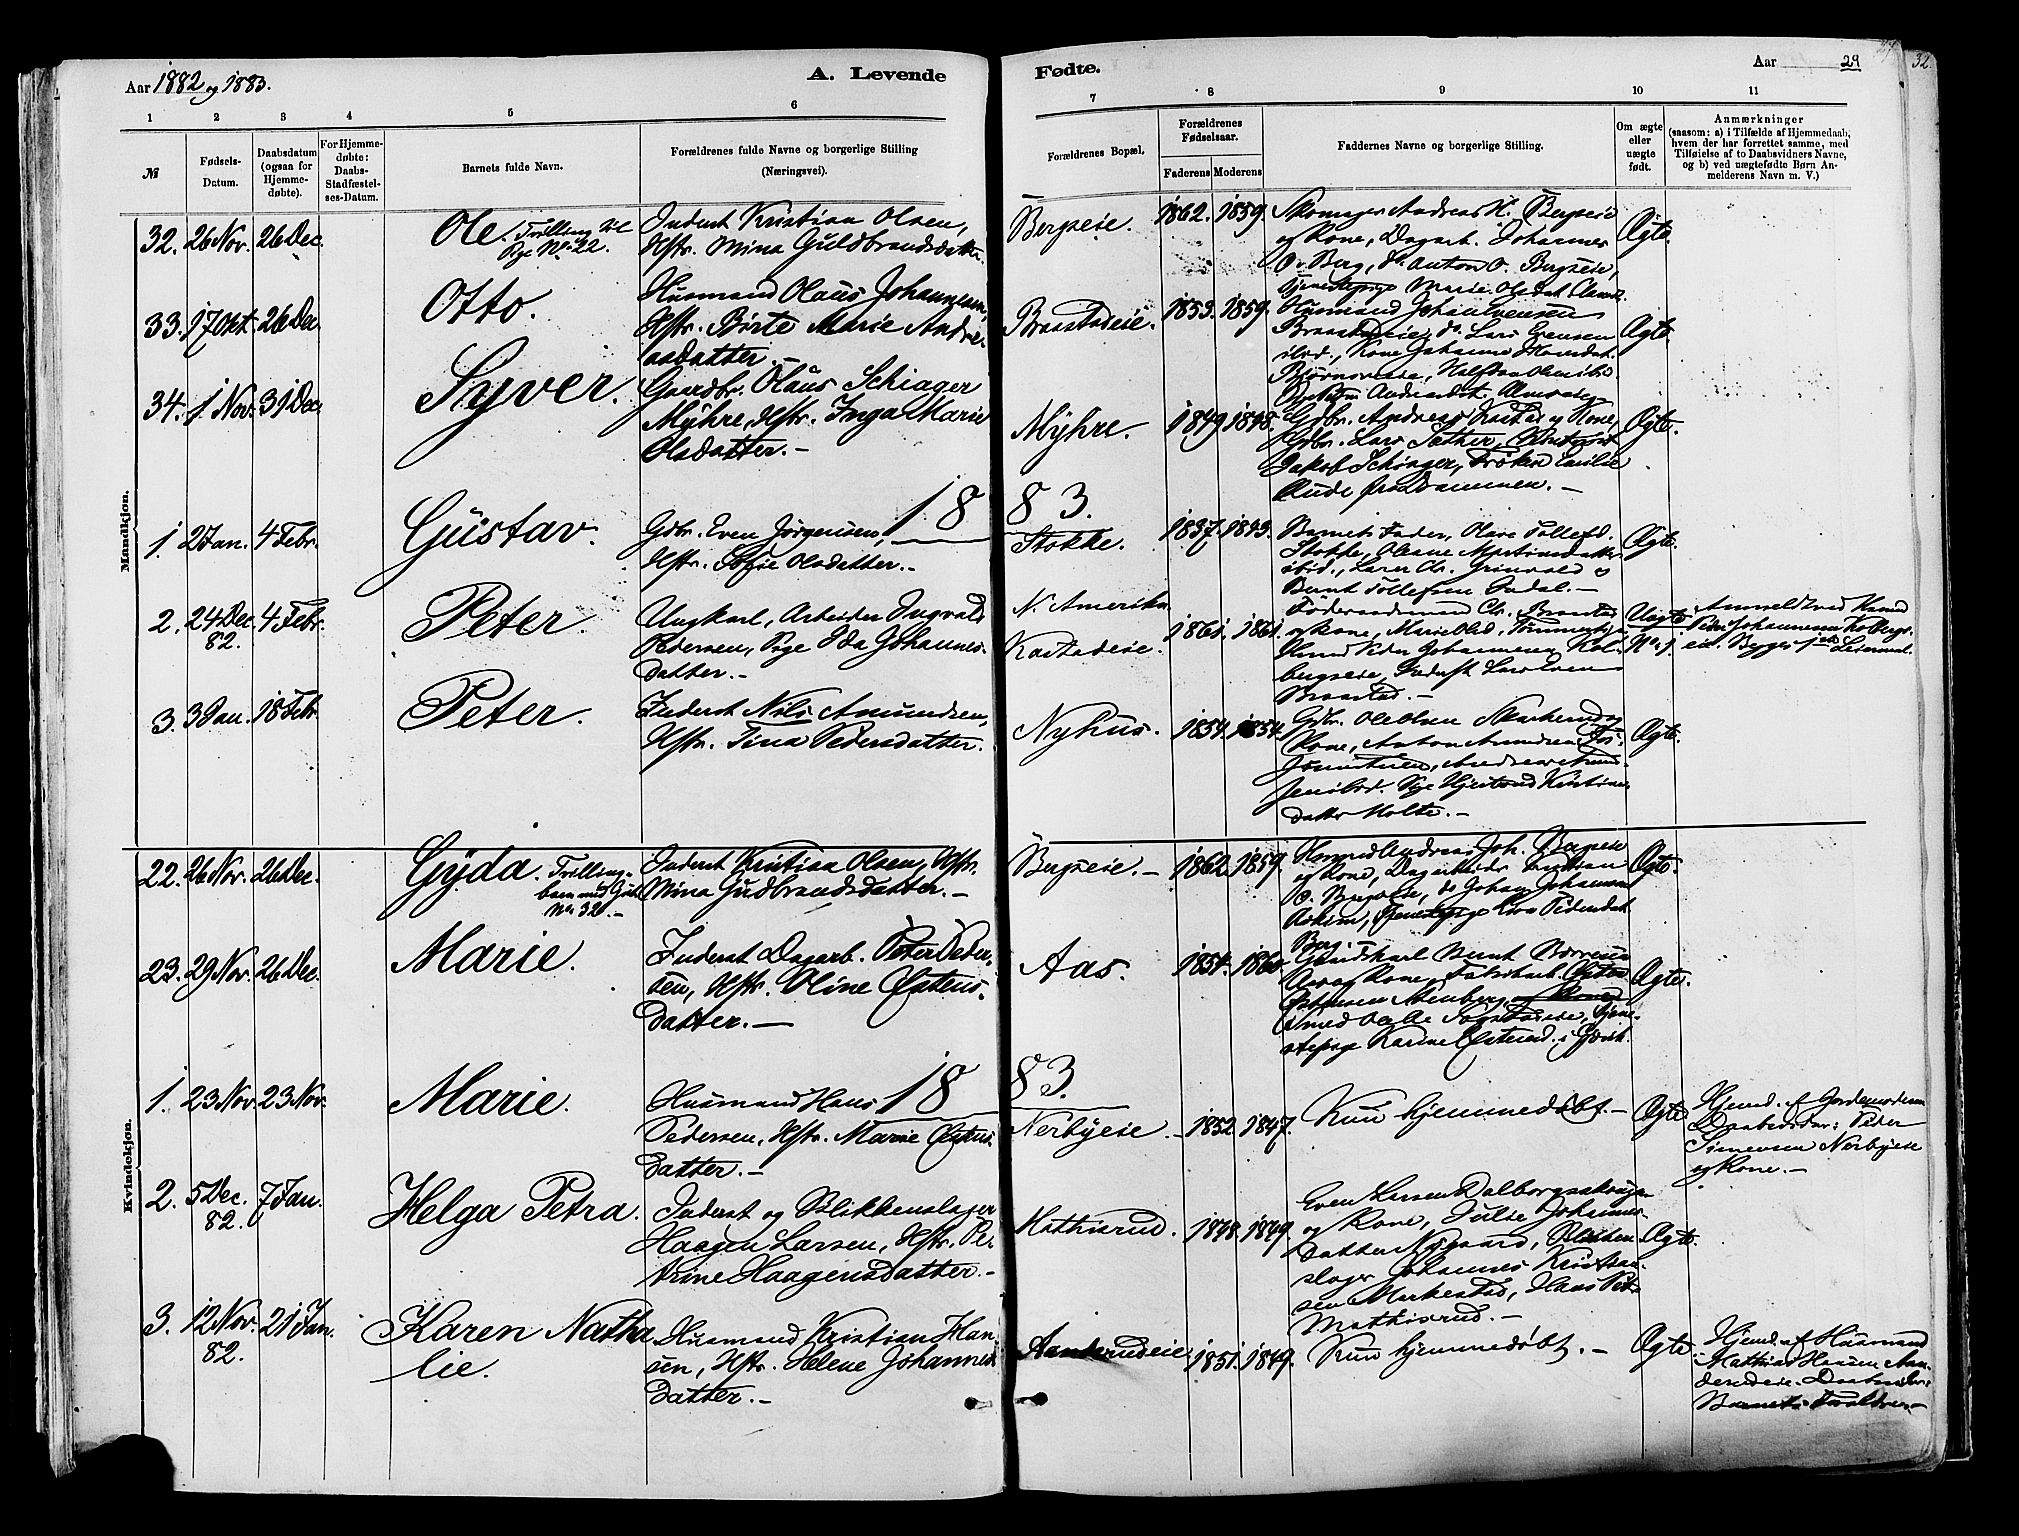 SAH, Vardal prestekontor, H/Ha/Haa/L0009: Ministerialbok nr. 9, 1878-1892, s. 29